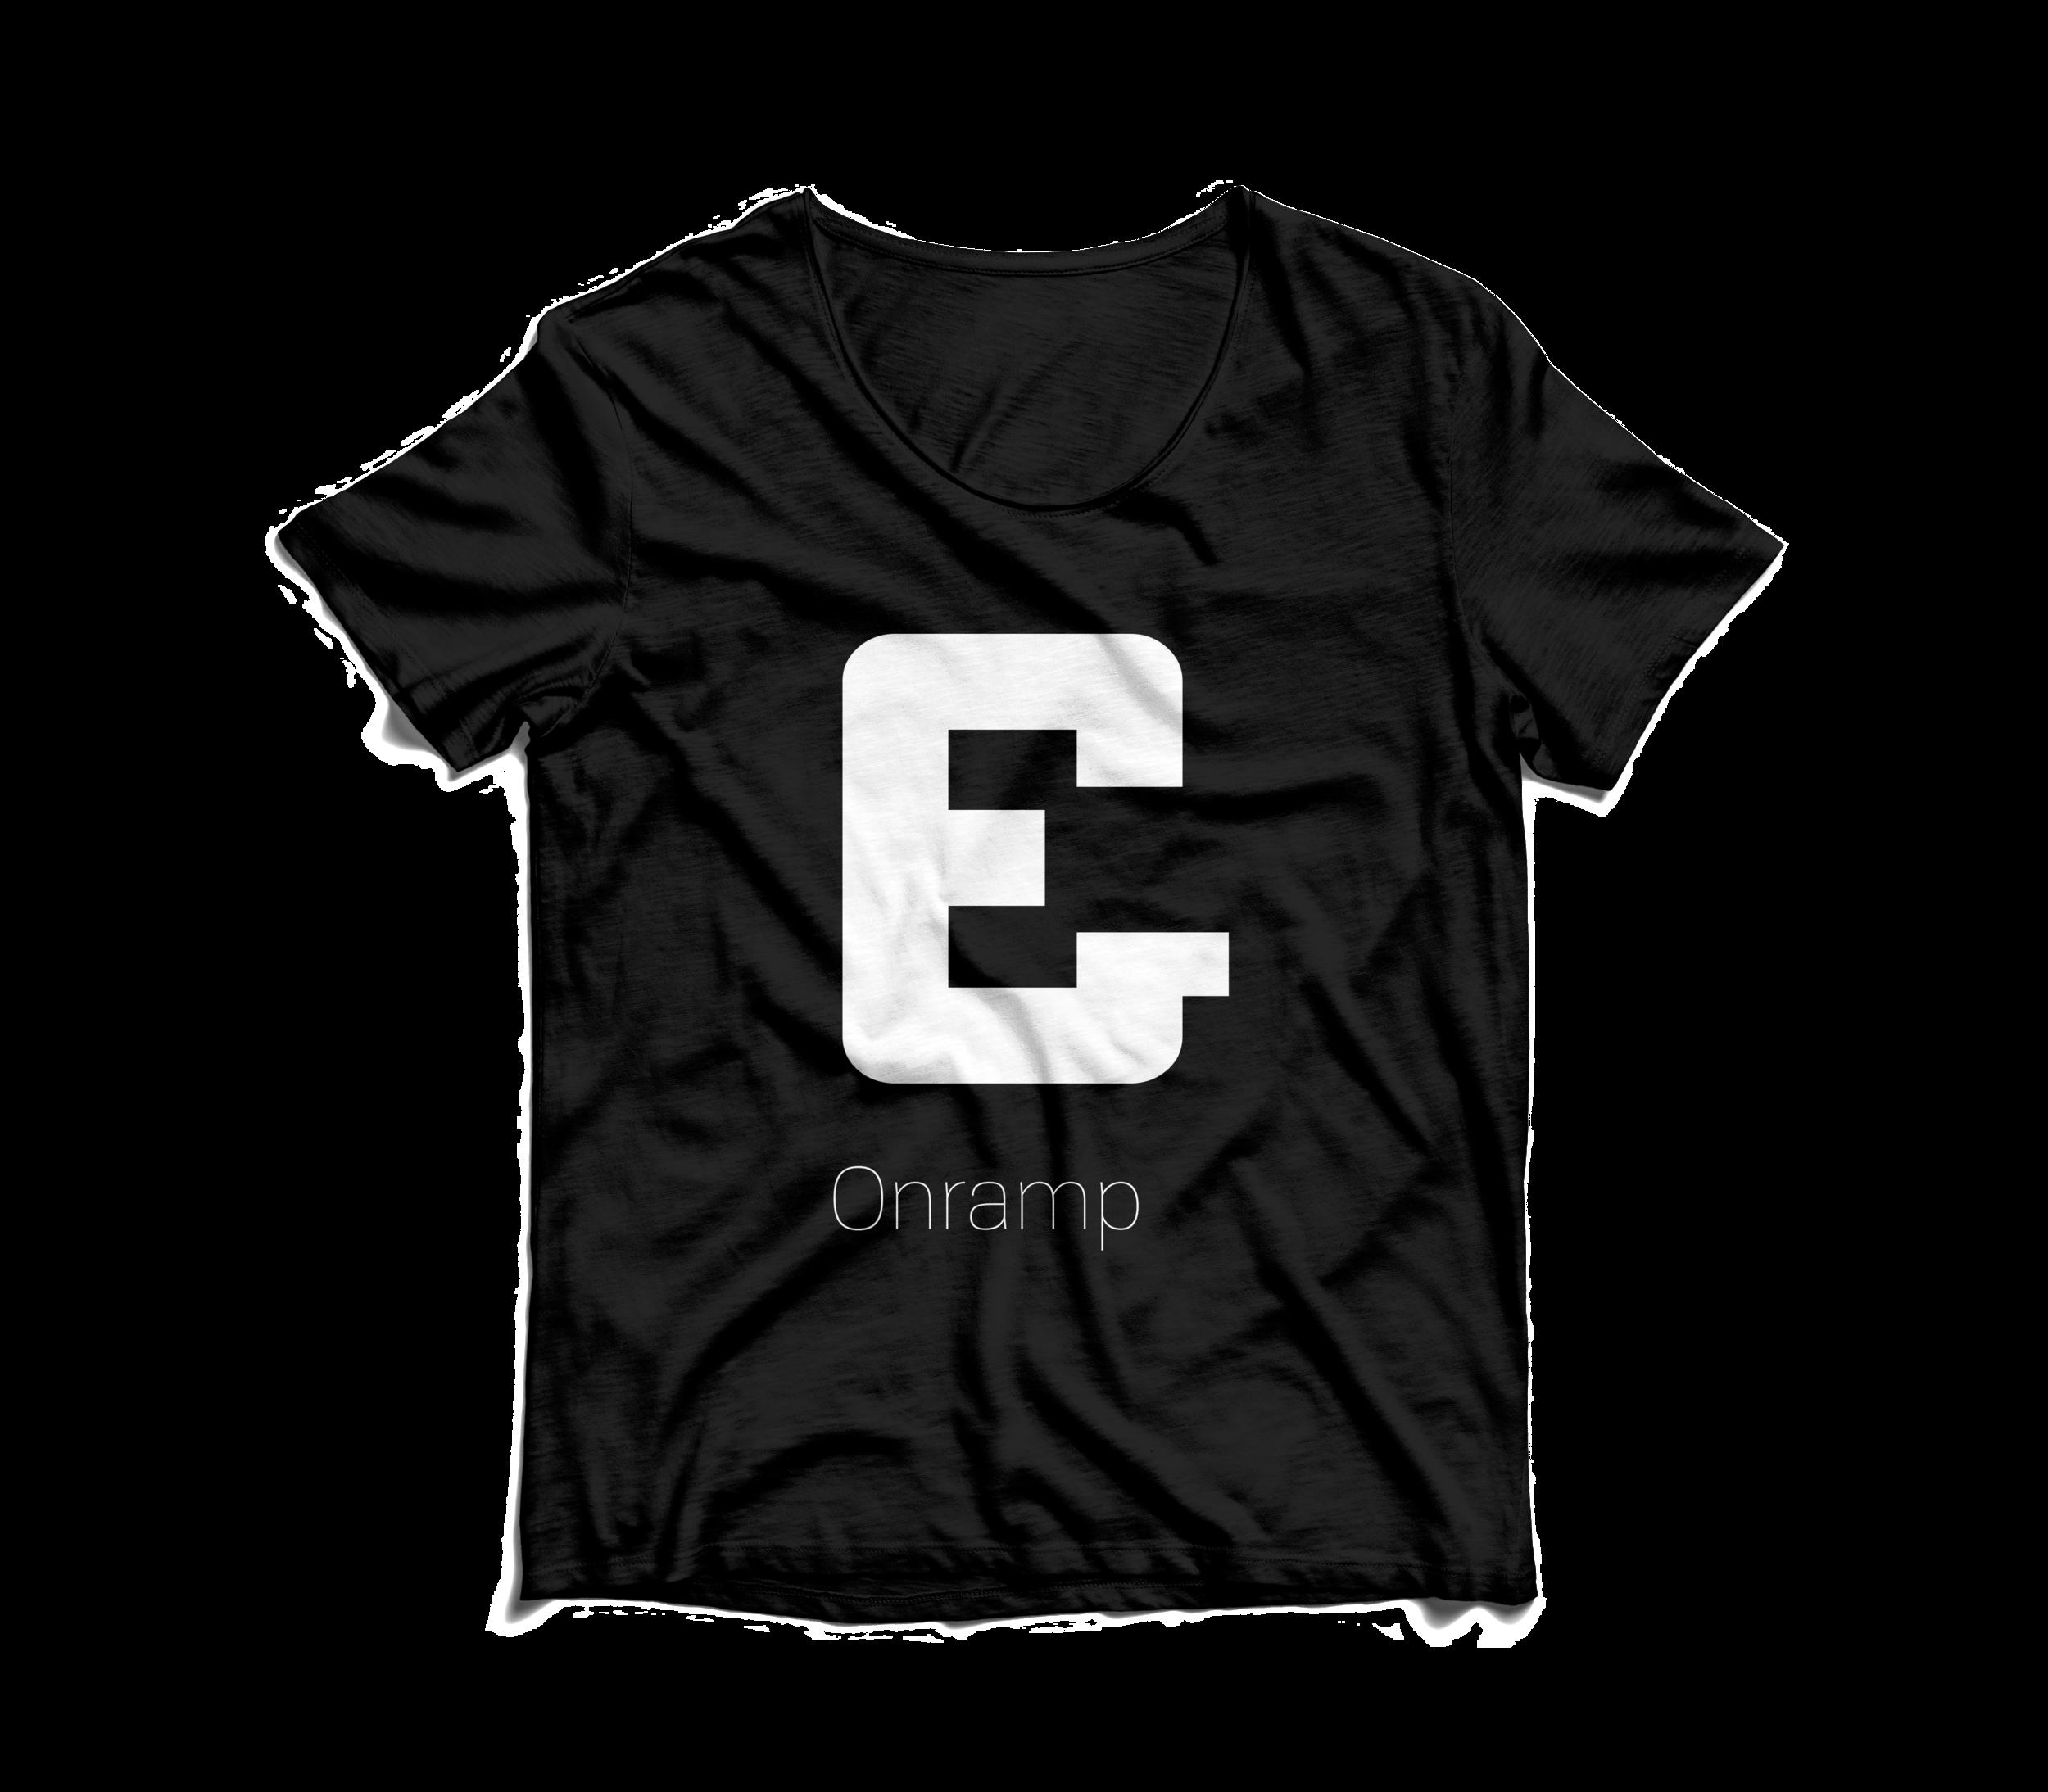 onramp ampersand tshirt.png